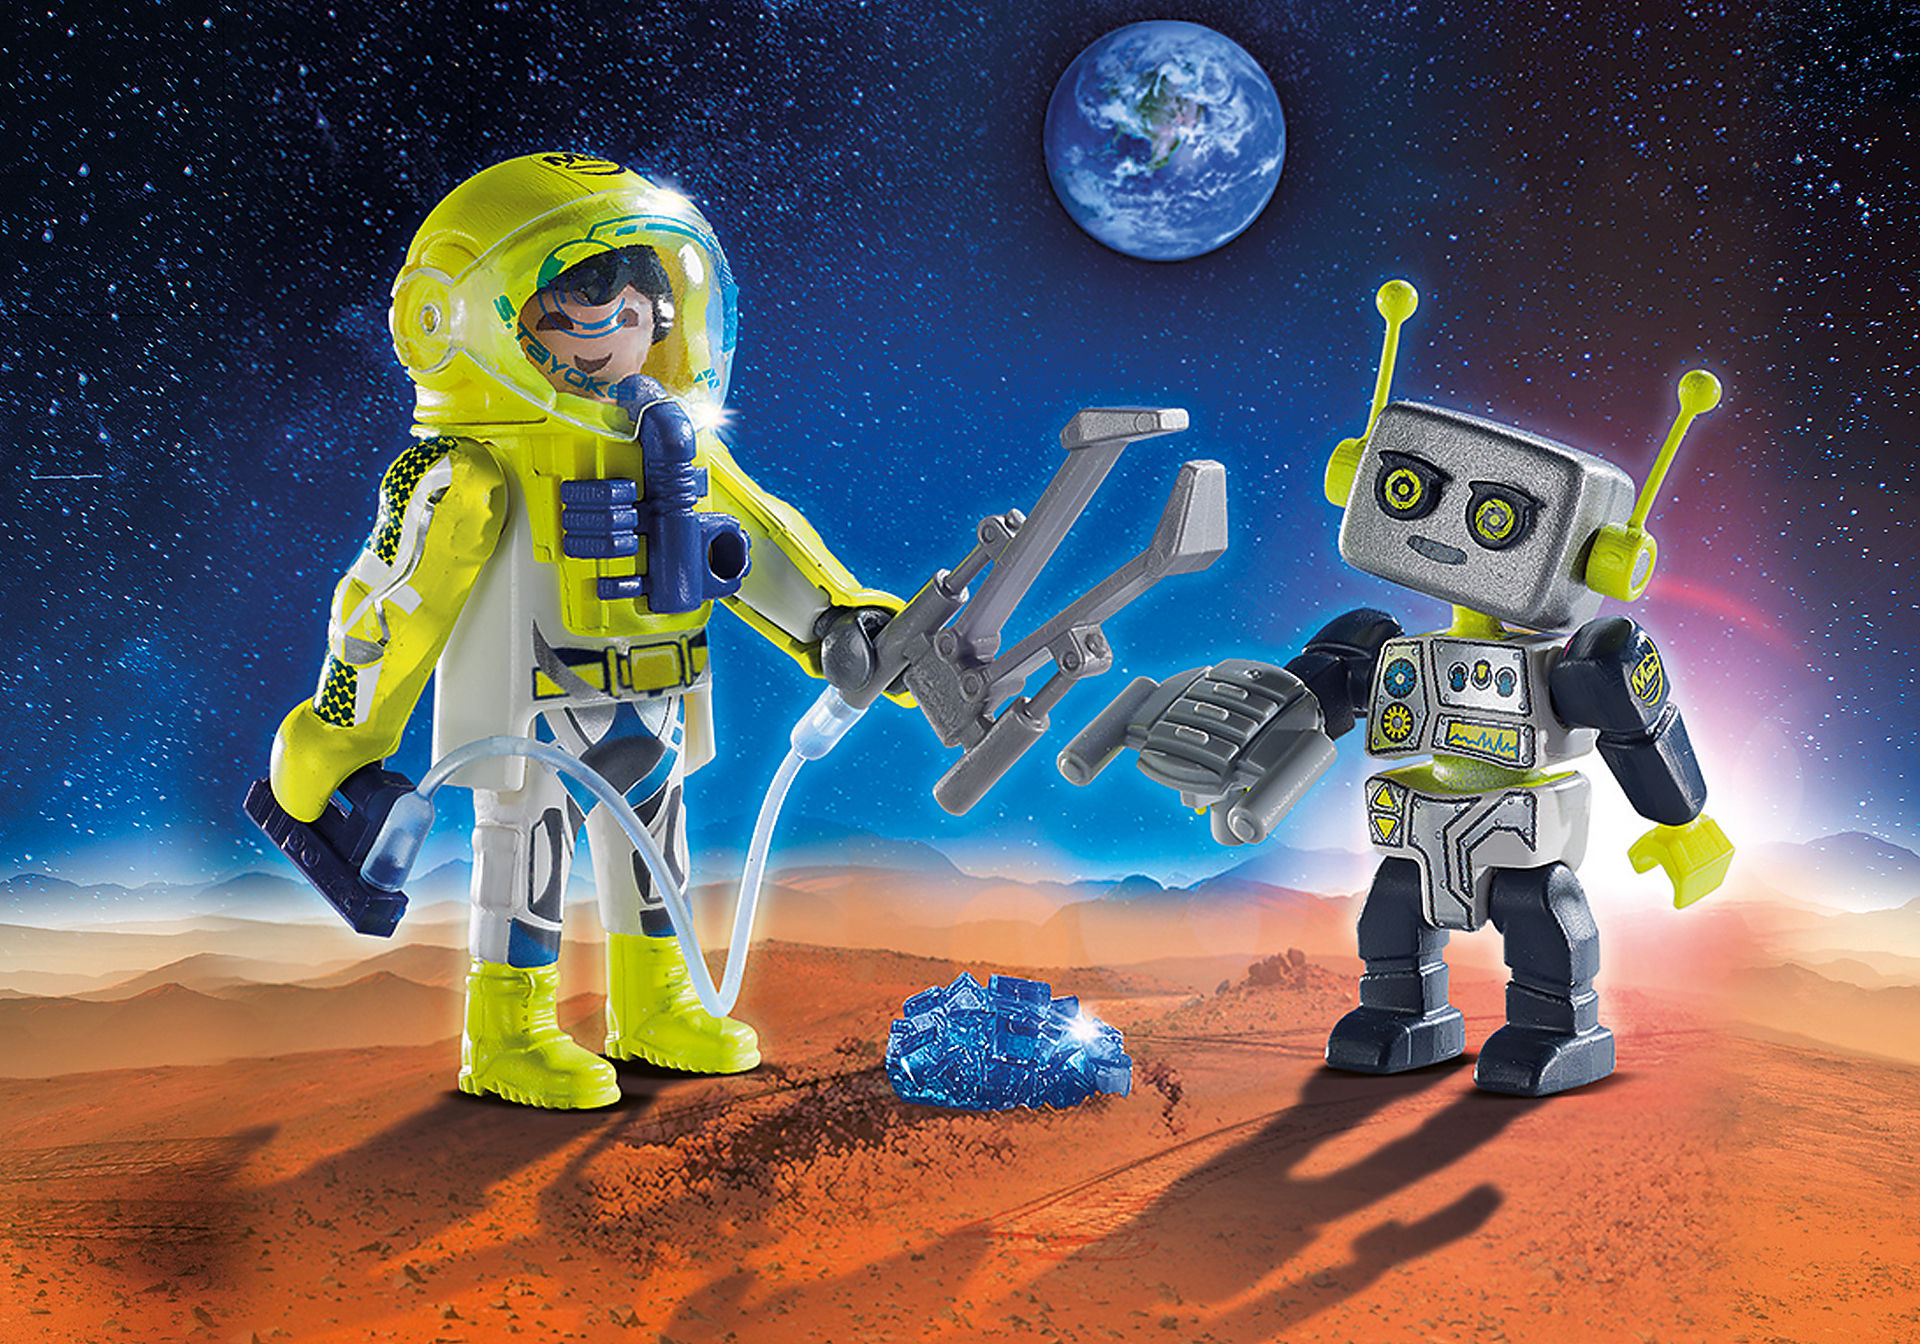 http://media.playmobil.com/i/playmobil/9492_product_detail/Duo Pack Αστροναύτης και ρομπότ